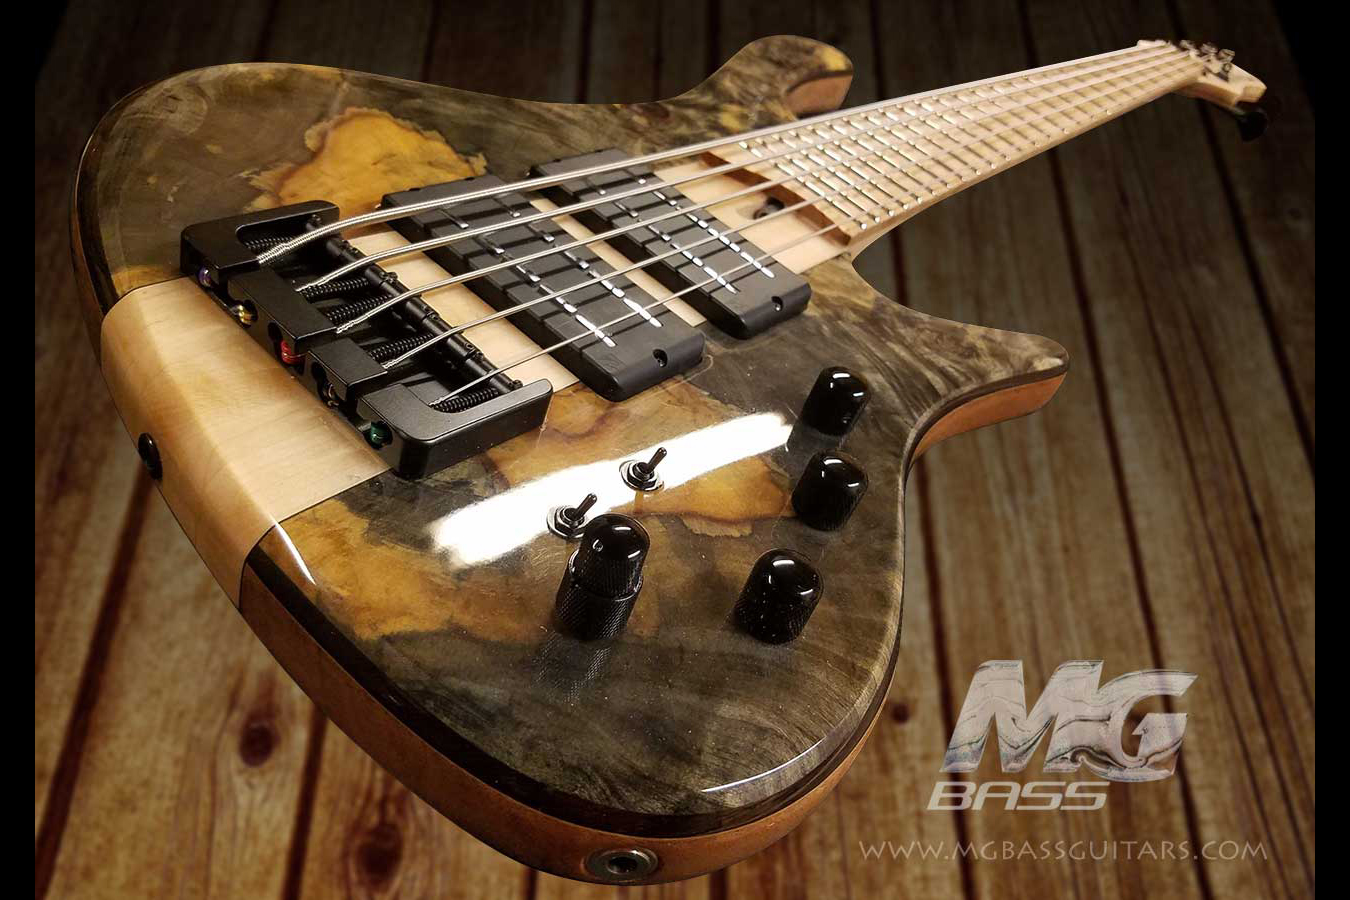 MG Bass Africa 5 Andy Irvine Signature Bass